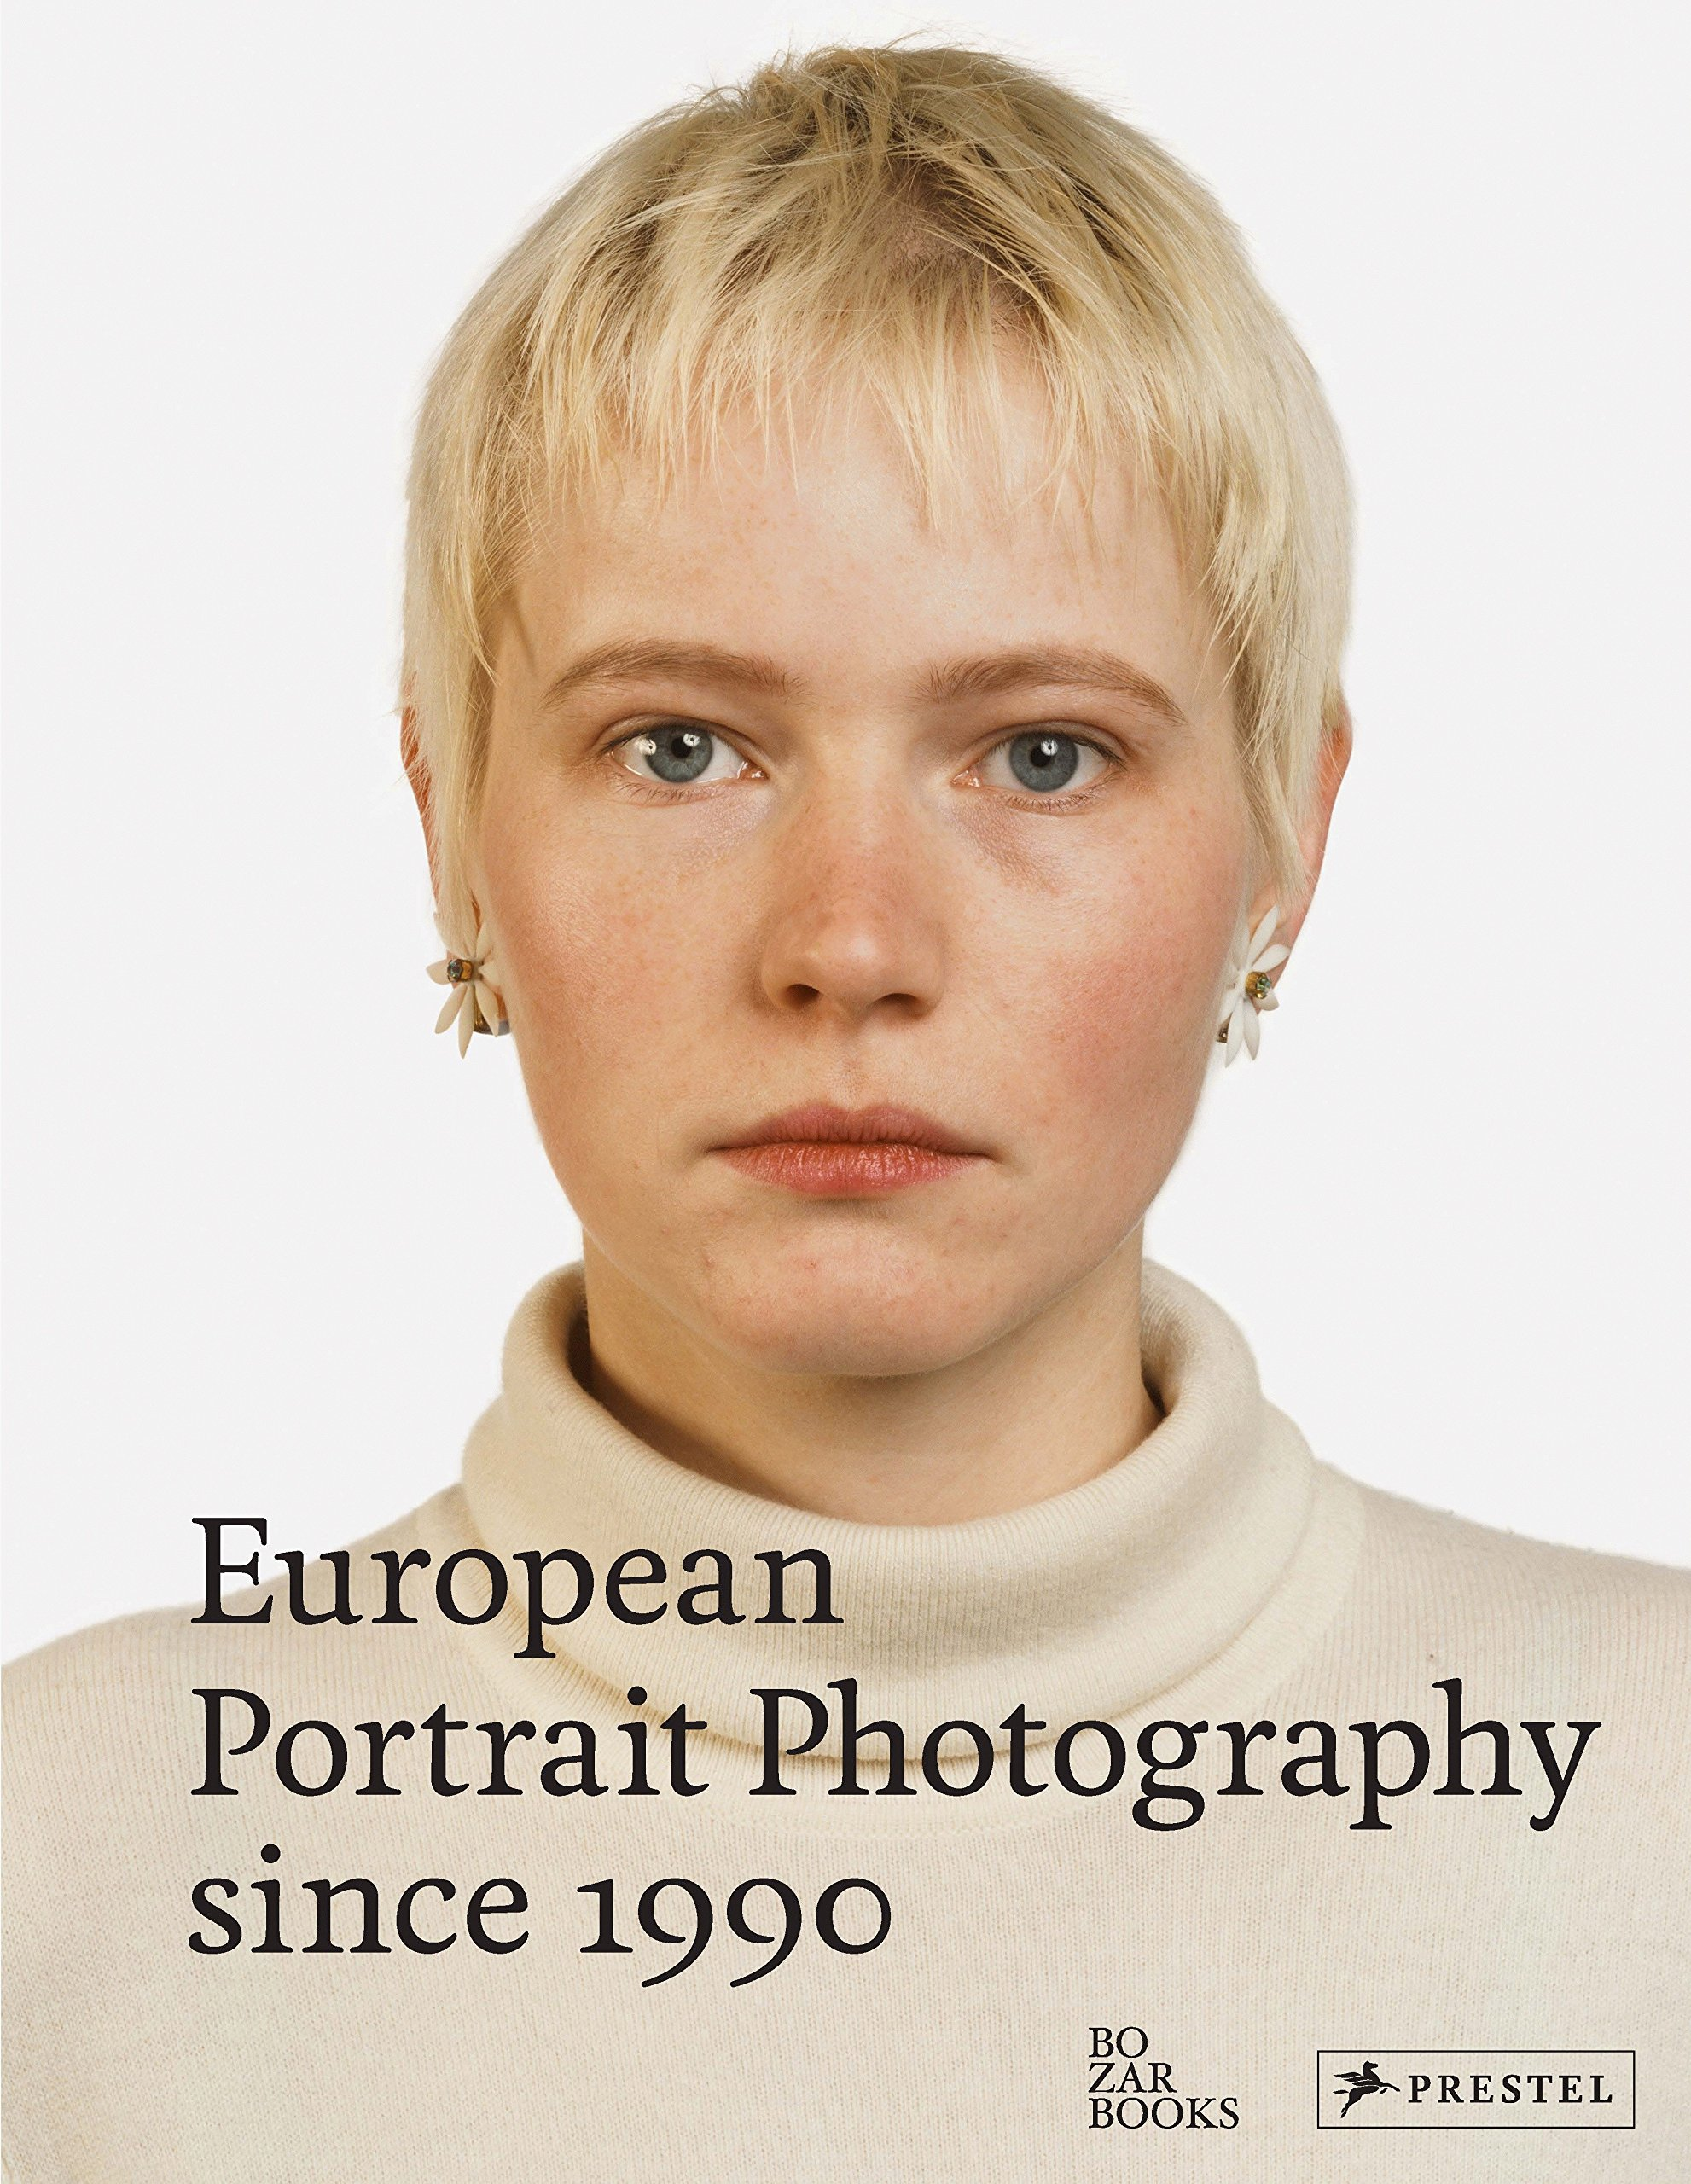 European Portrait Photography by Prestel